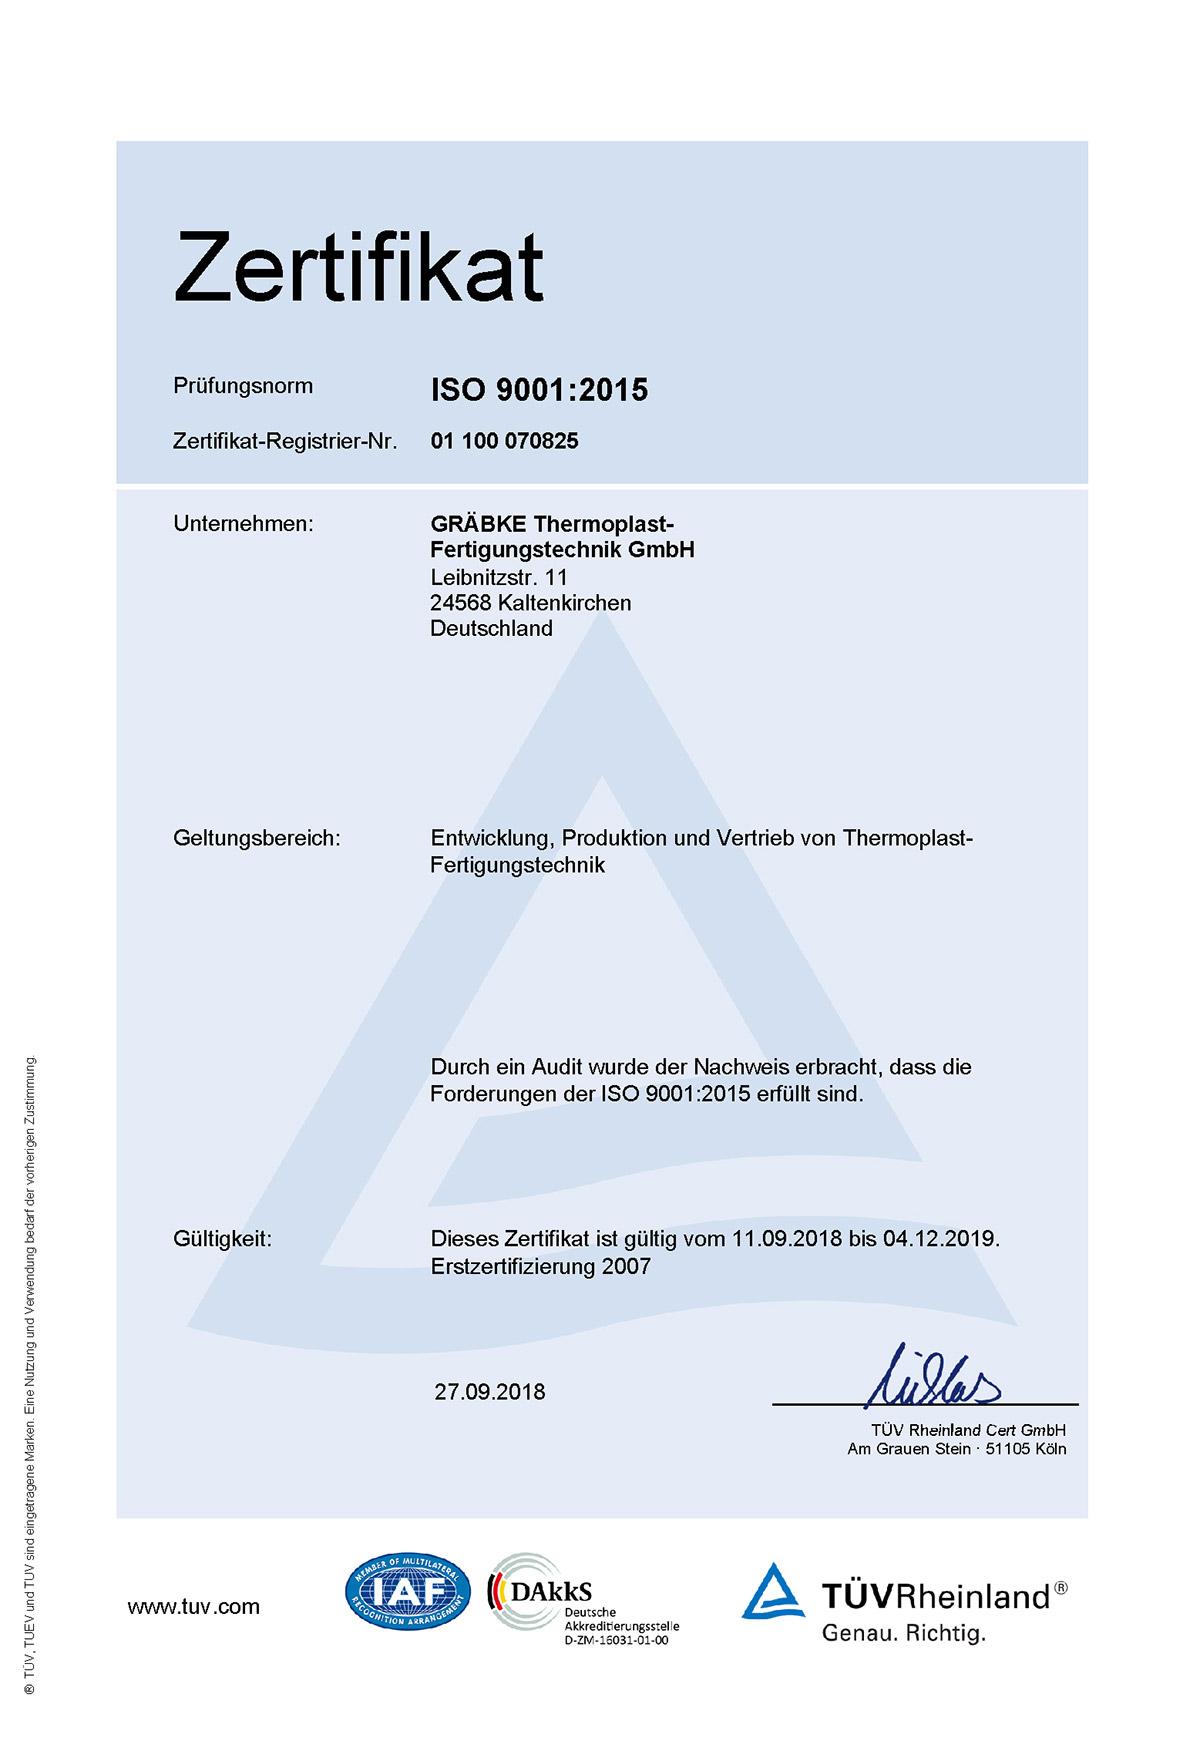 Gräbke Thermoplast-Fertigungstechnik – ISO-Zertifikat 9001:2015